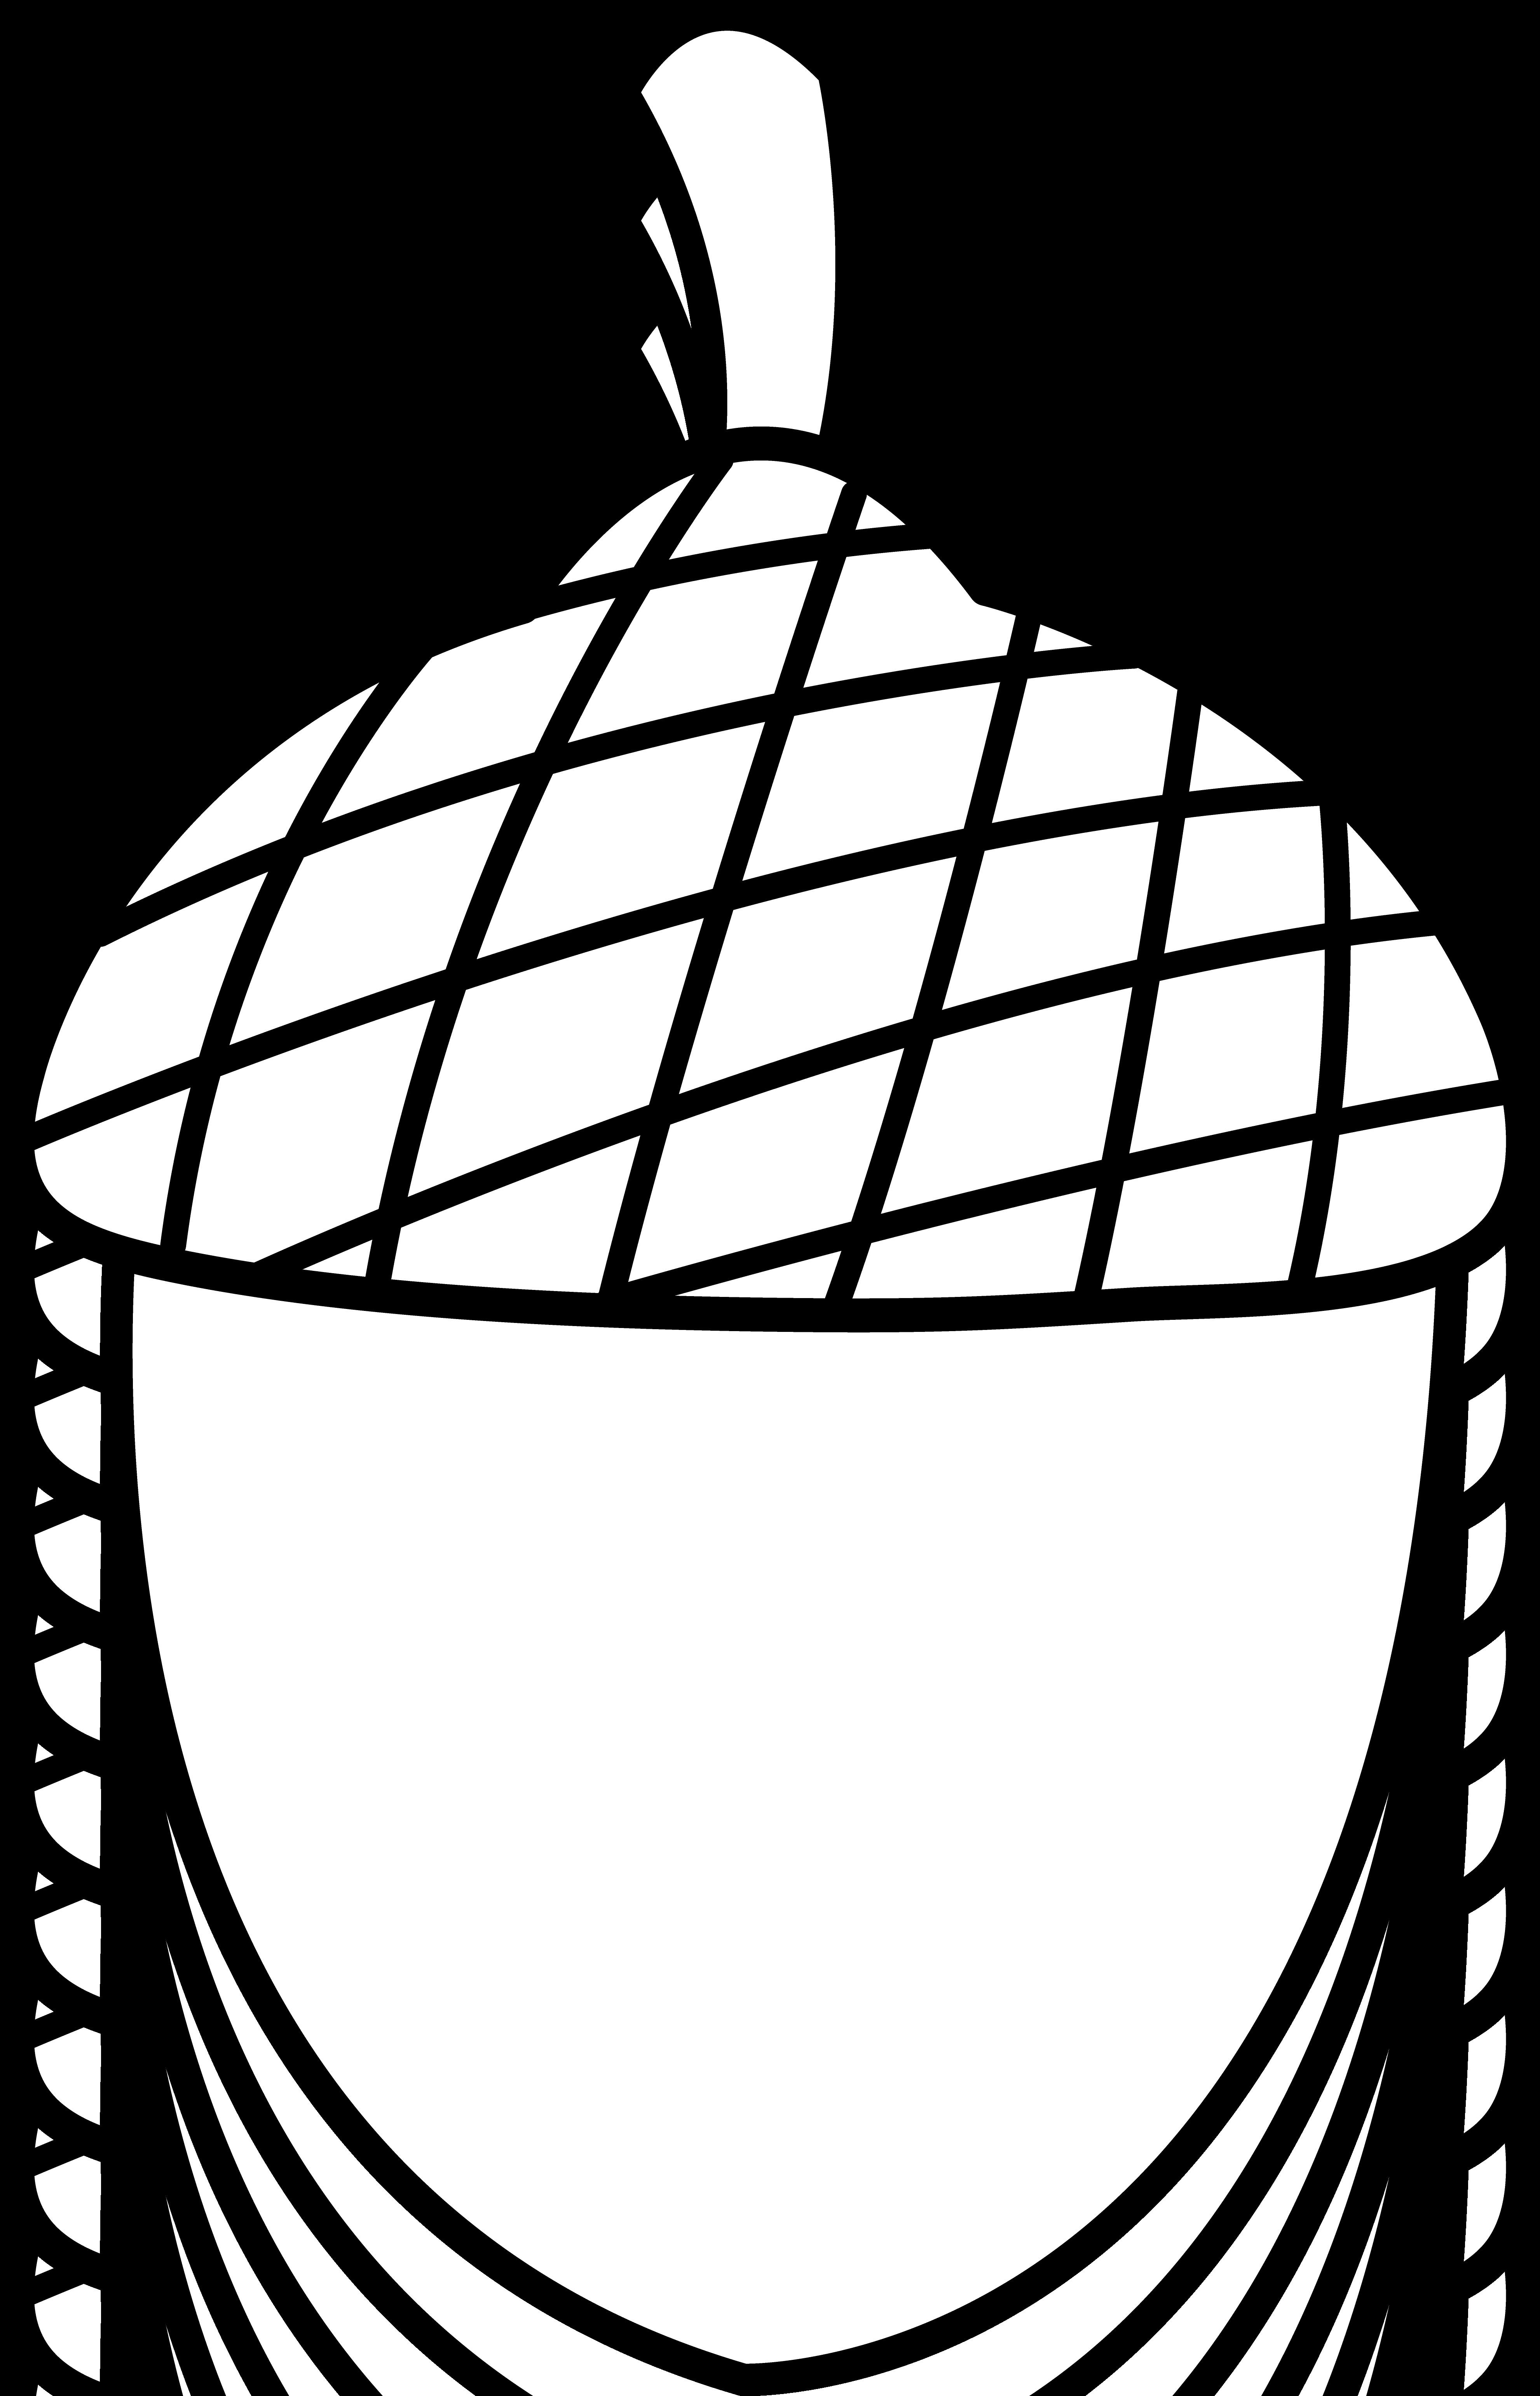 Nut Clipart-nut clipart-17